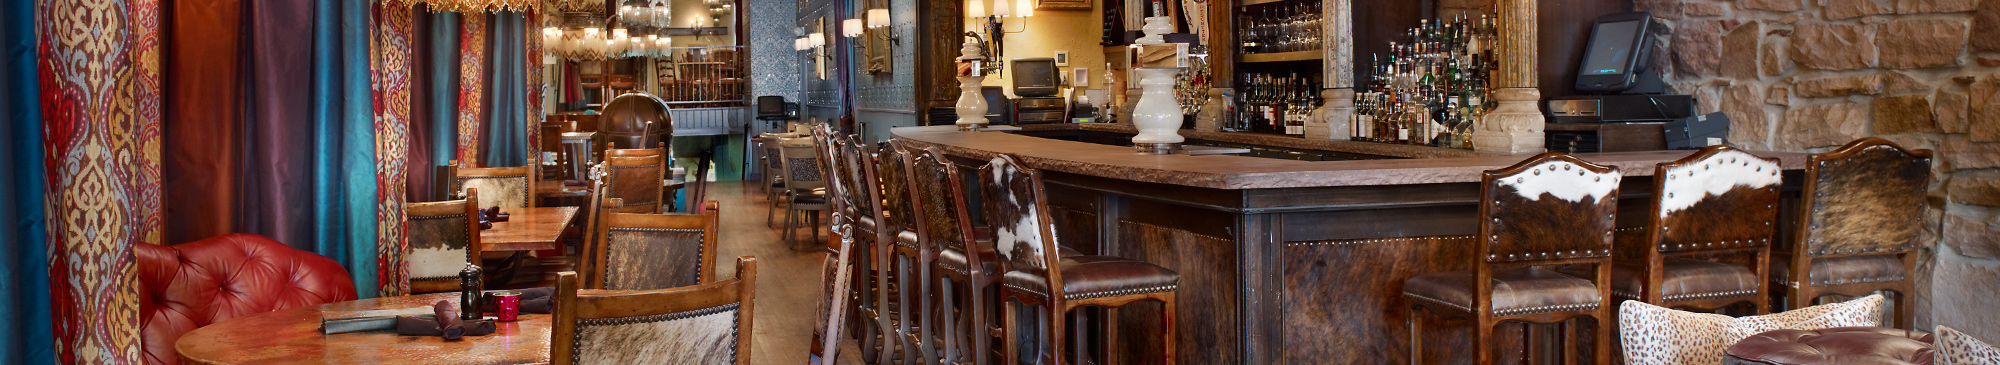 Crawford's bar and restaurant designed by DeWitt